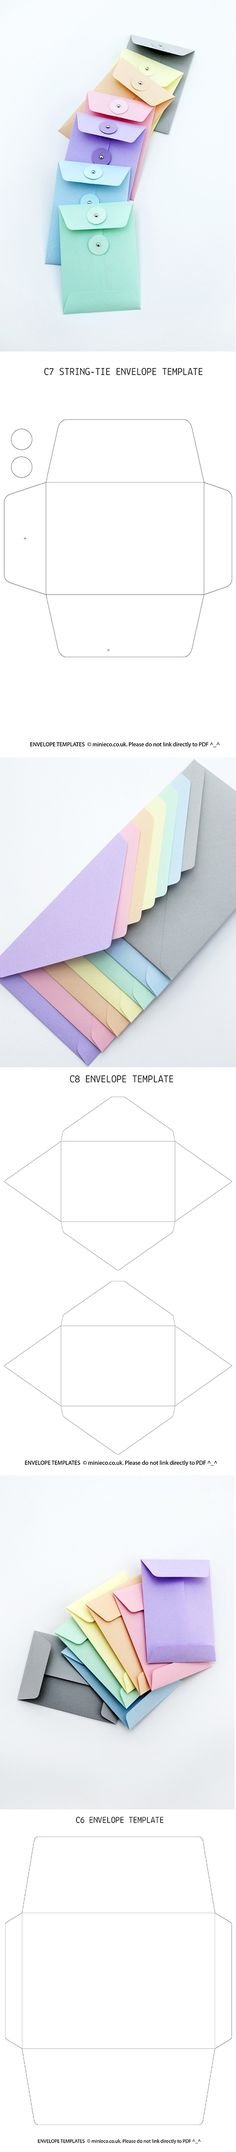 Free Envelope Templates (C6, C7, C8)  String-tie & standard designs by KarenLoko